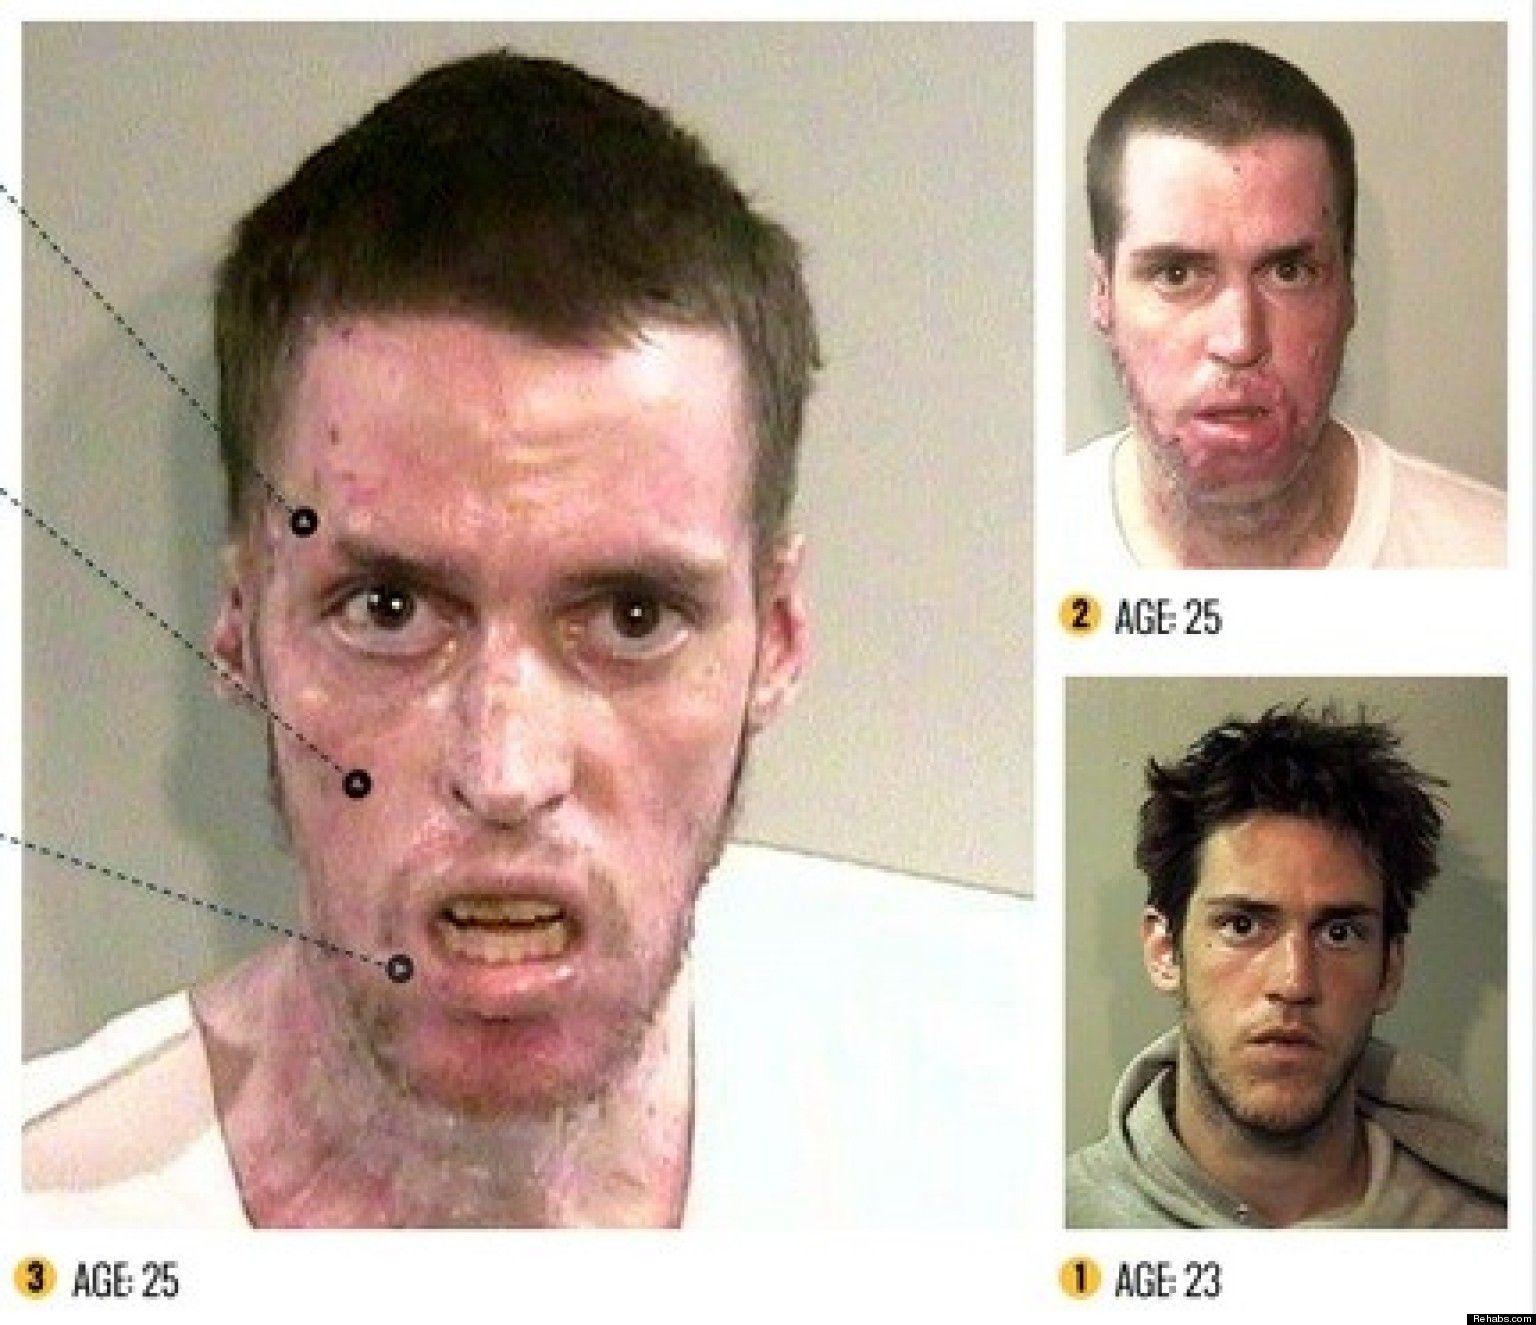 Meth  >> New Anti Meth Campaign Is Health Terrorism Dental Humor